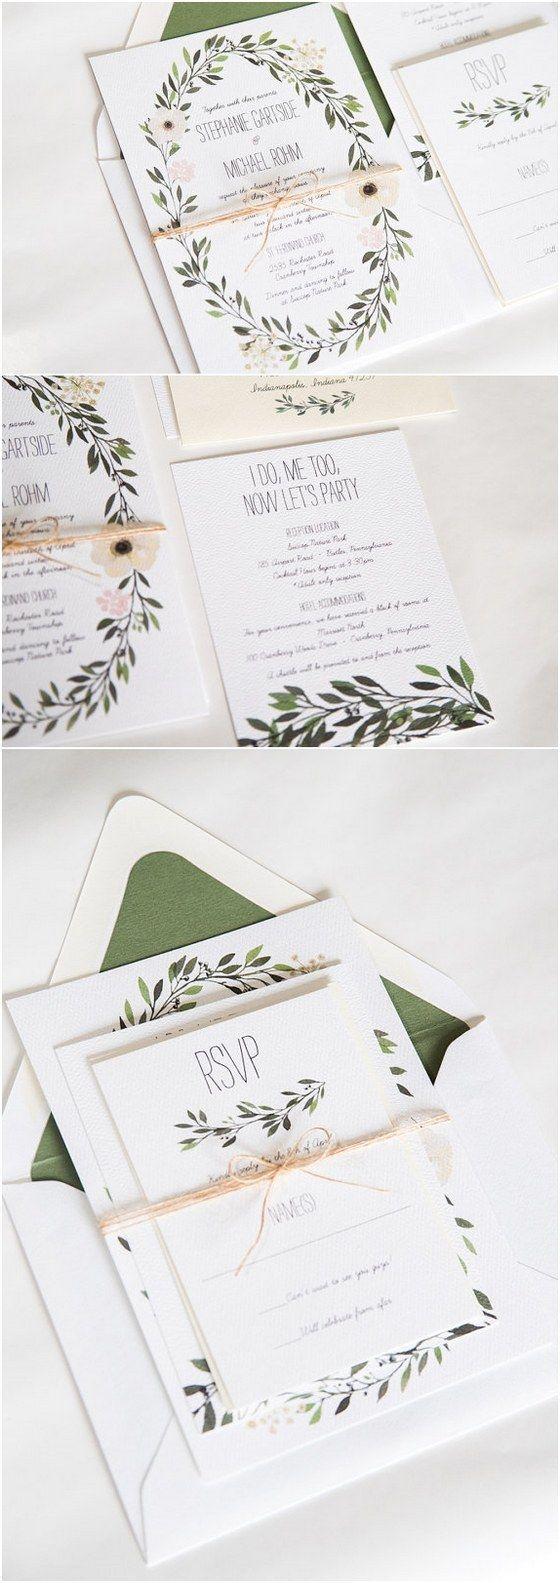 Watercolor Wreath Greenery Wedding Invitation / http://www.deerpearlflowers.com/29-watercolor-wedding-invitations/2/